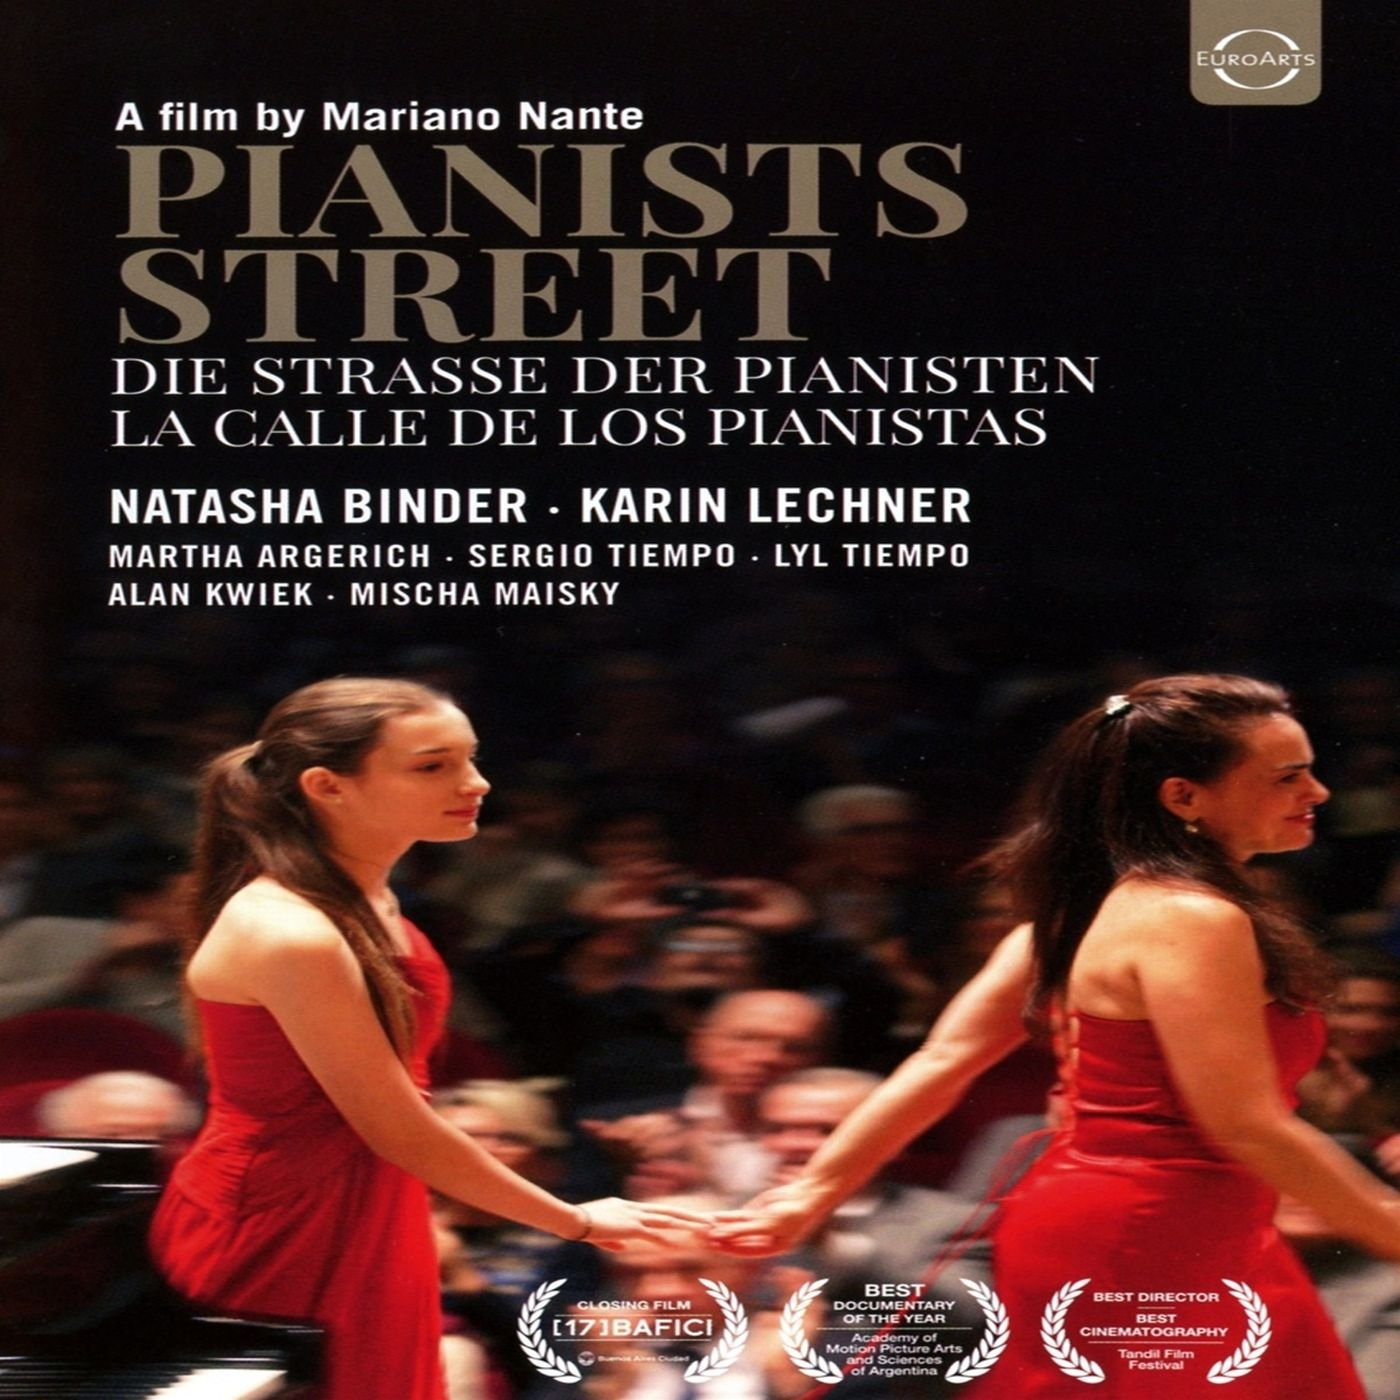 DVD : Tiempo Lechner Binder Argerich - Pianists Street-la Calle De Los Pianistas (DVD)